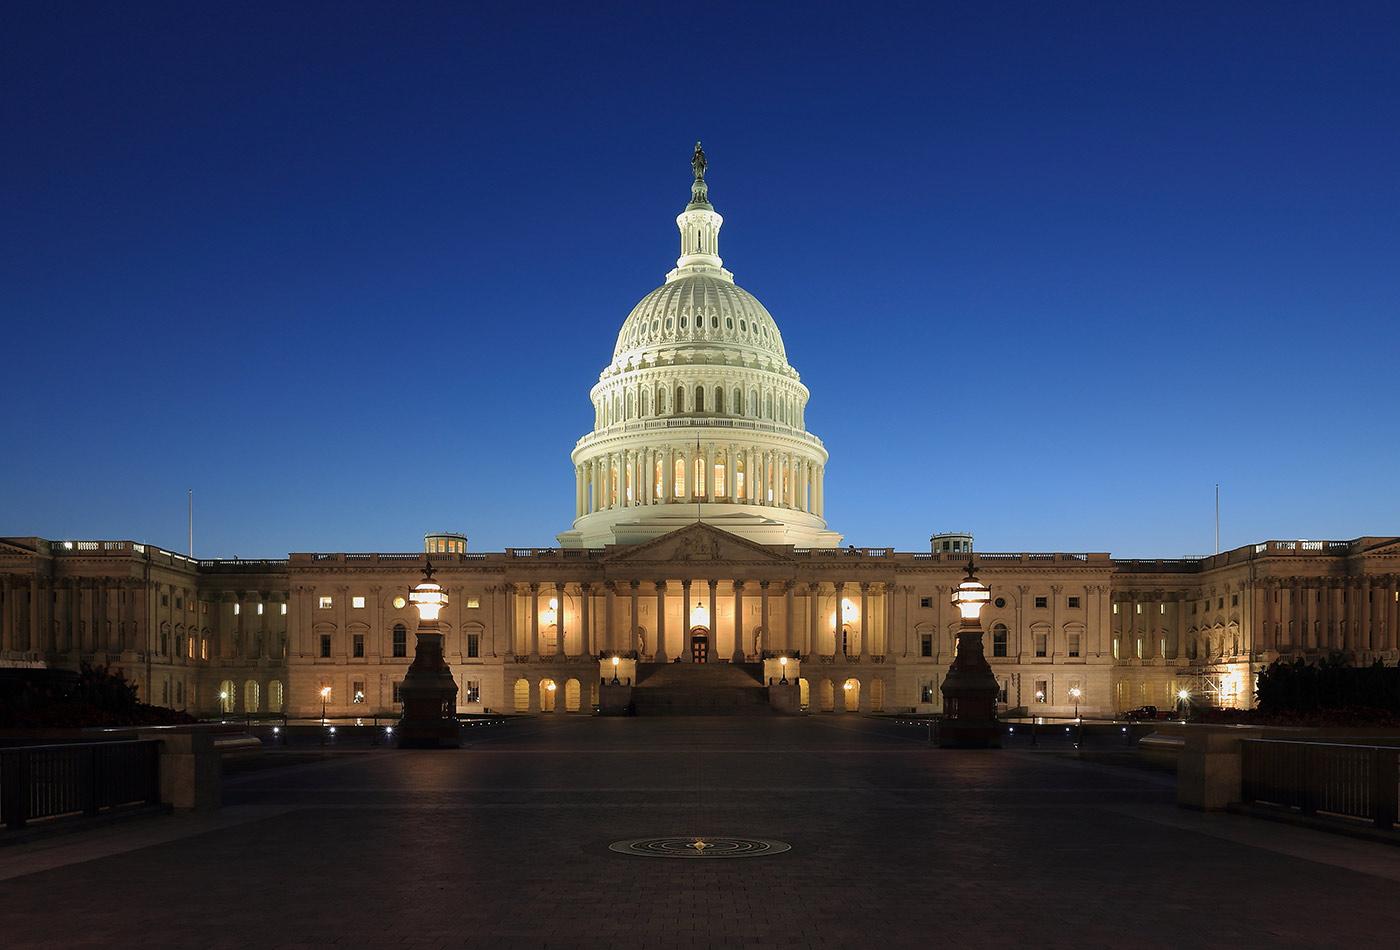 US Capitol at dusk.